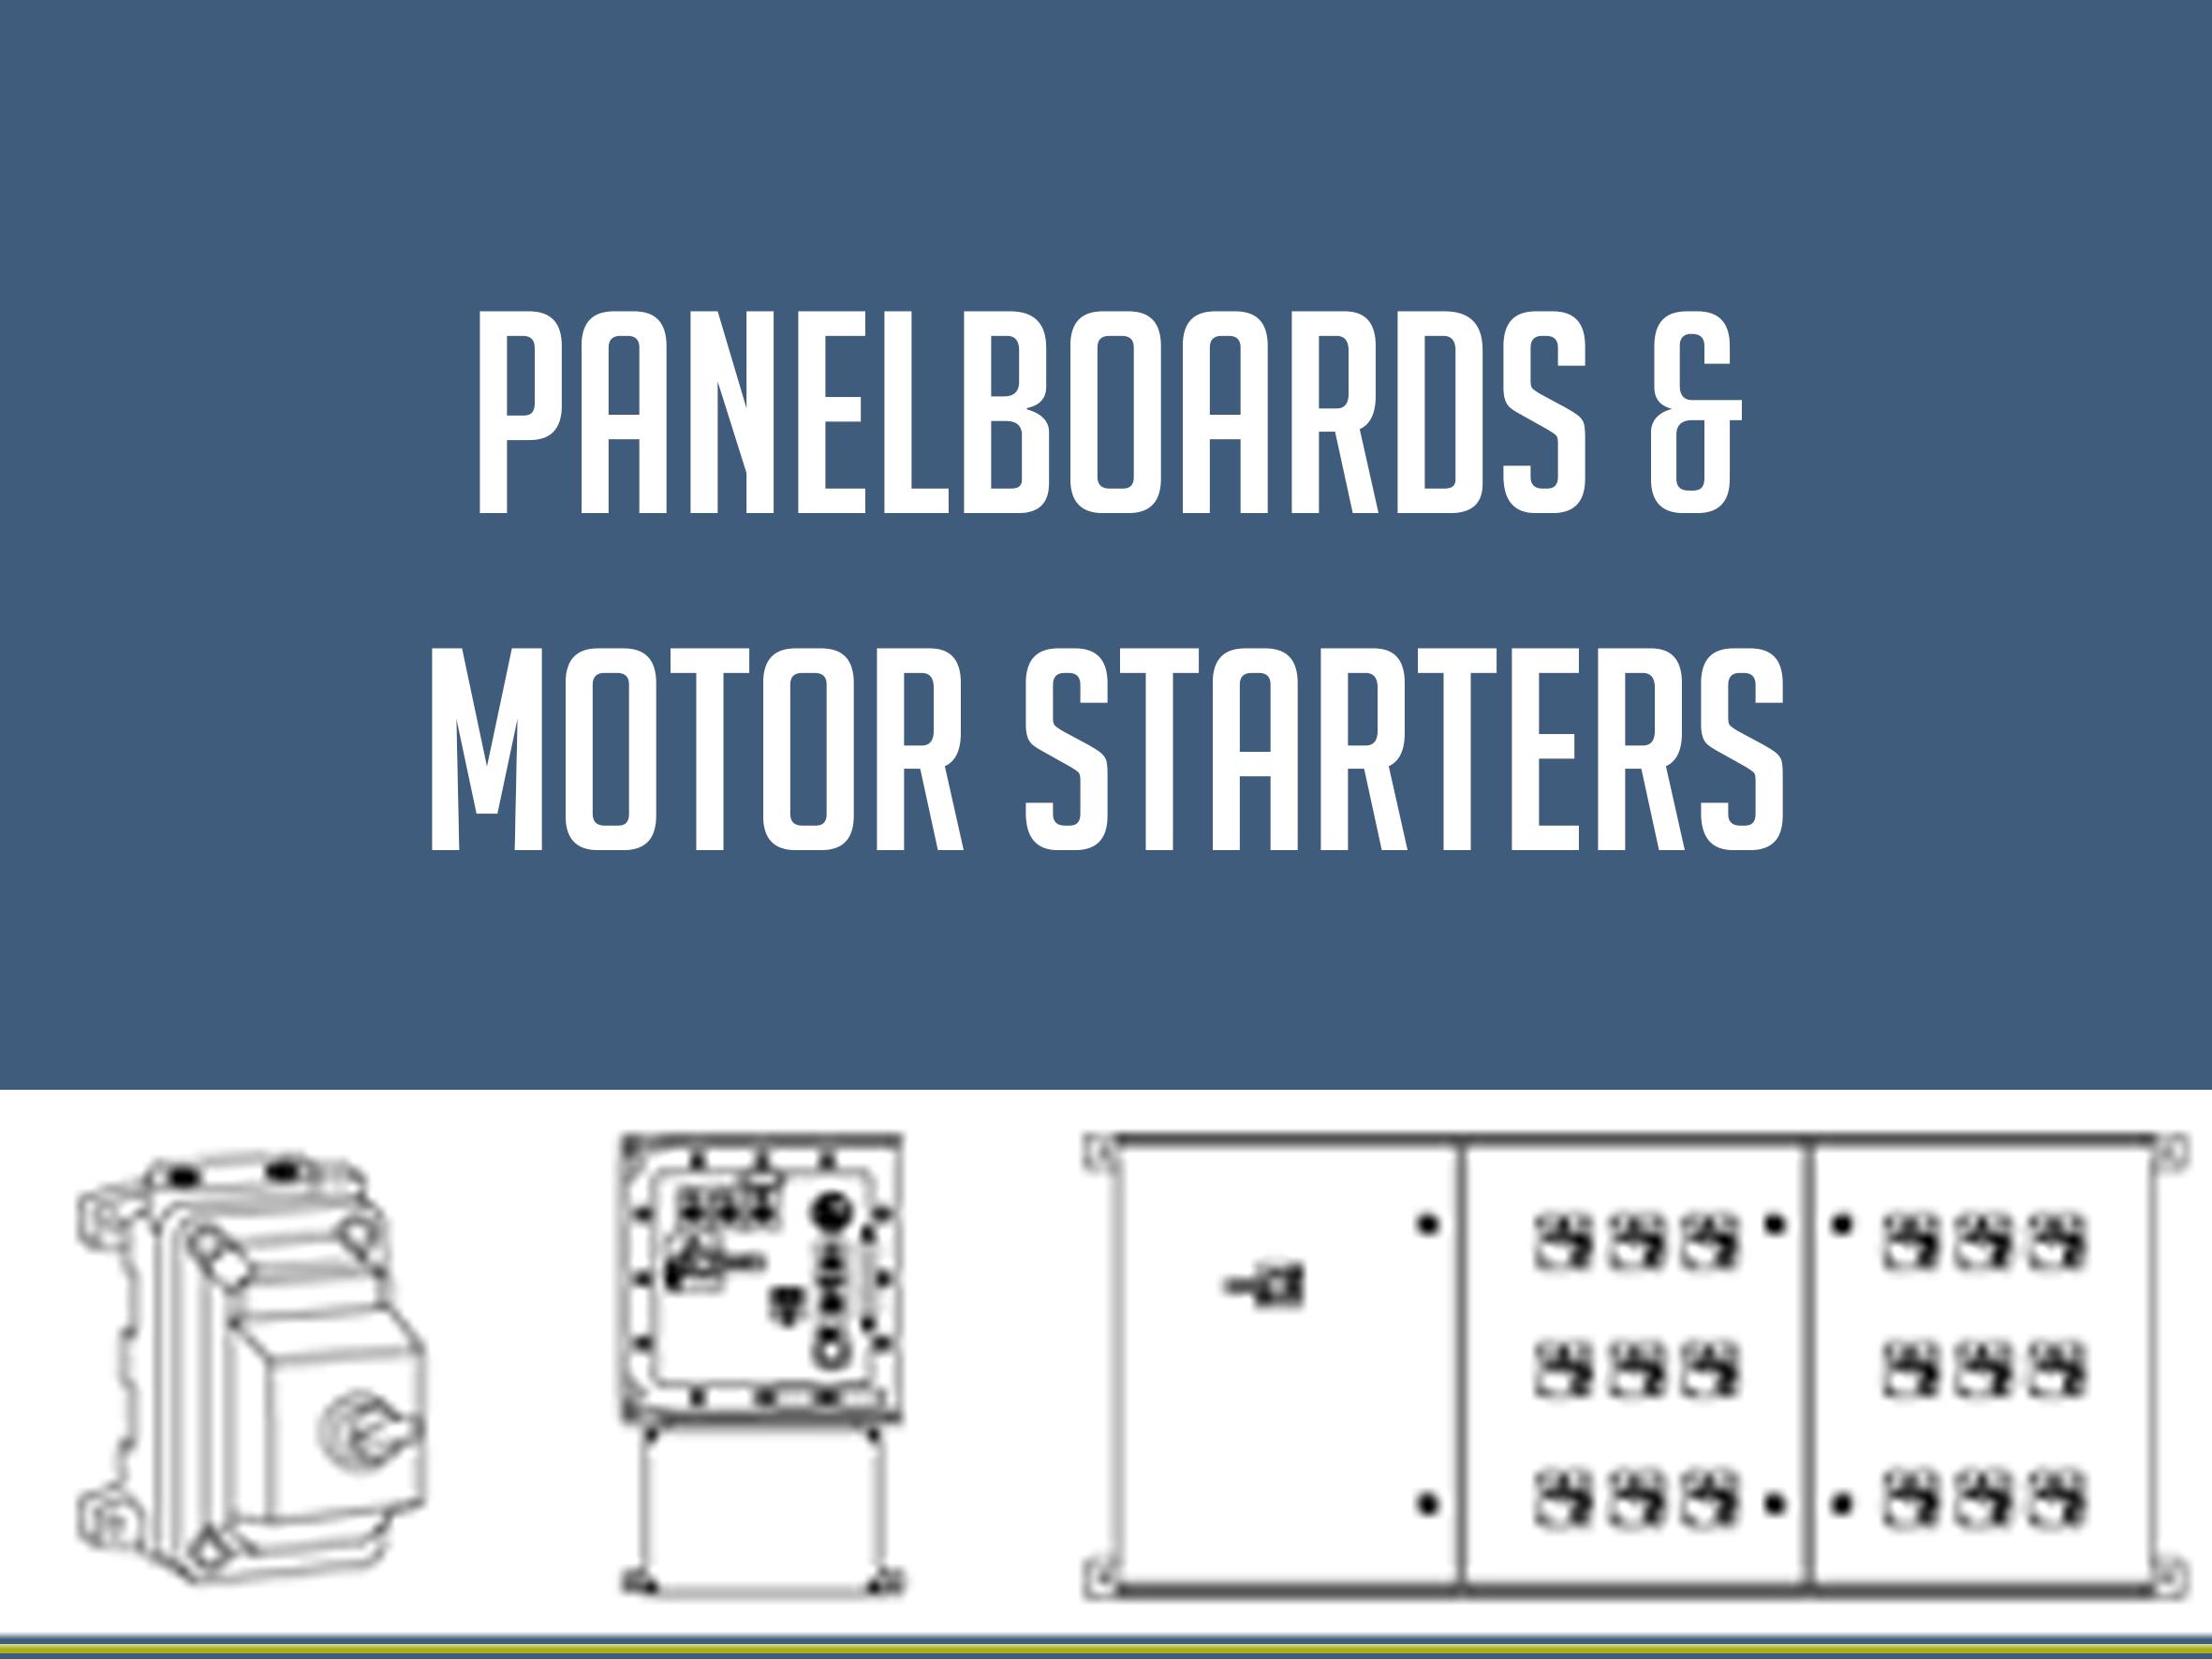 PANELBOARDS & MOTOR STARTERS